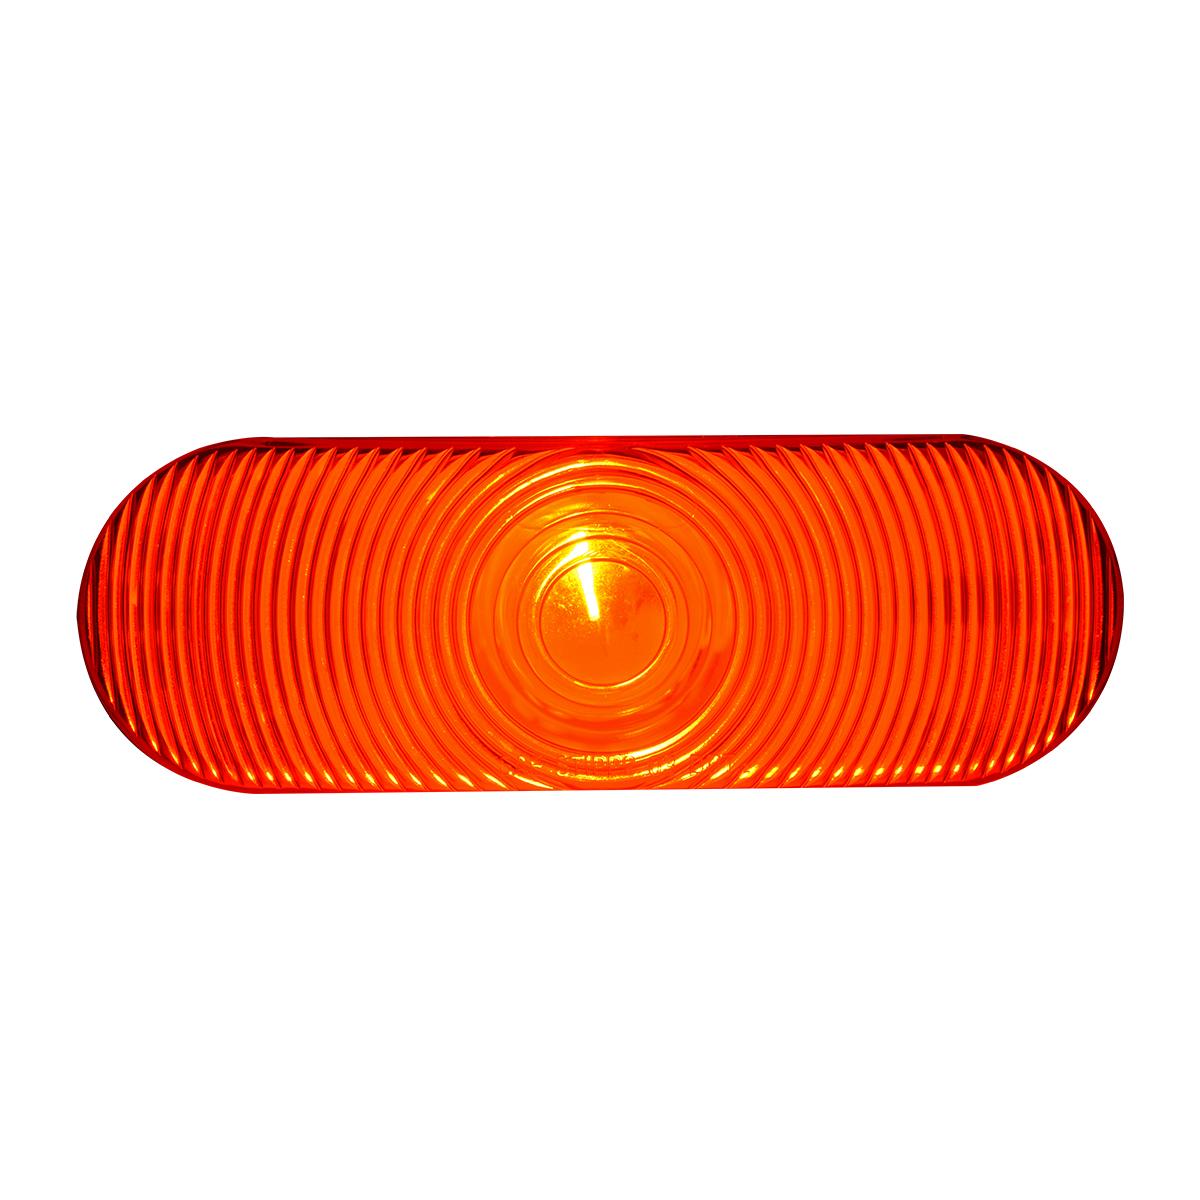 #80805 Oval Sealed Incandescent Flat Red/Red Lights